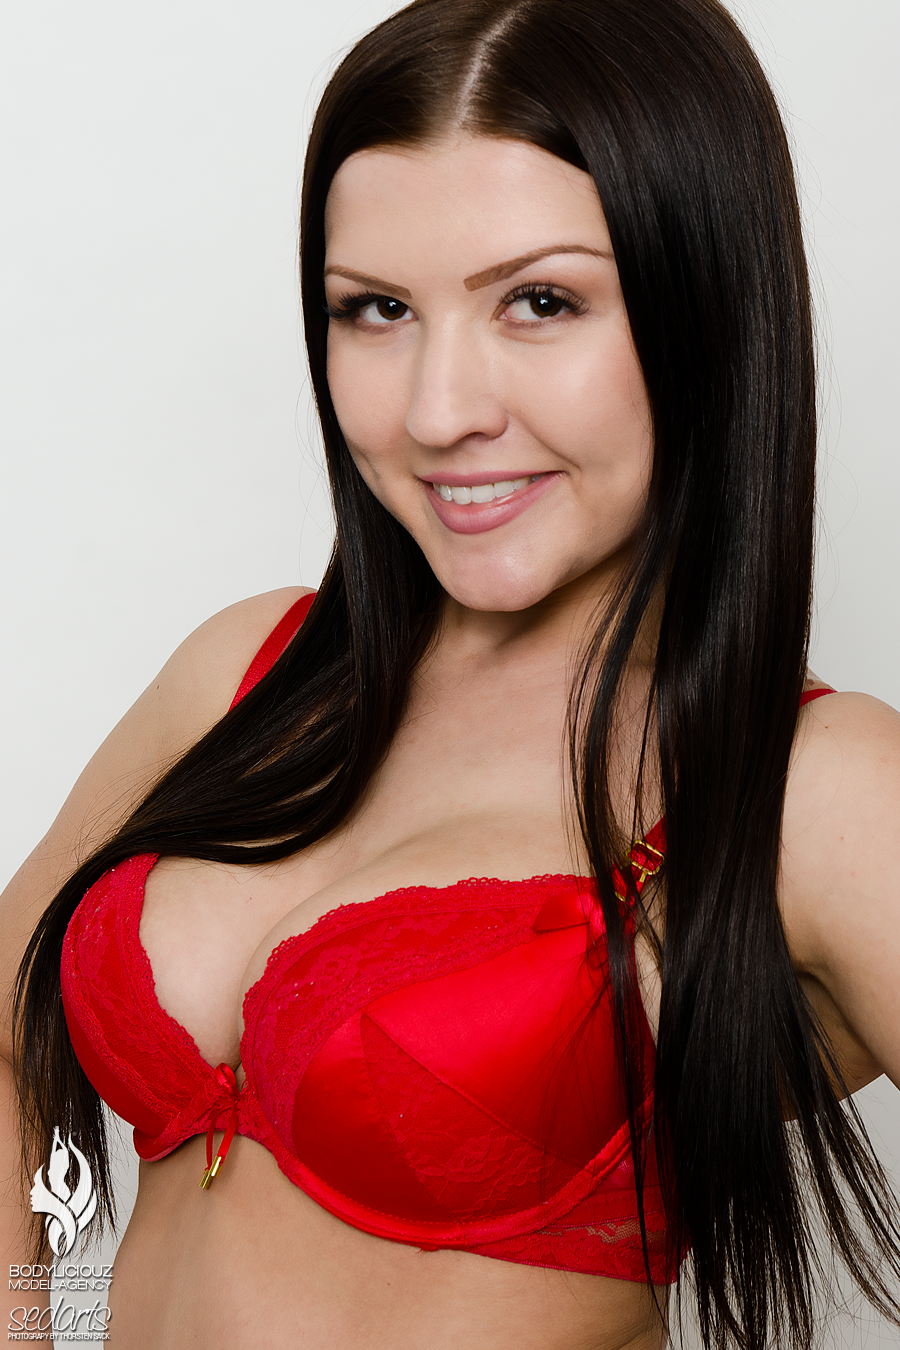 Natalia Jufkina